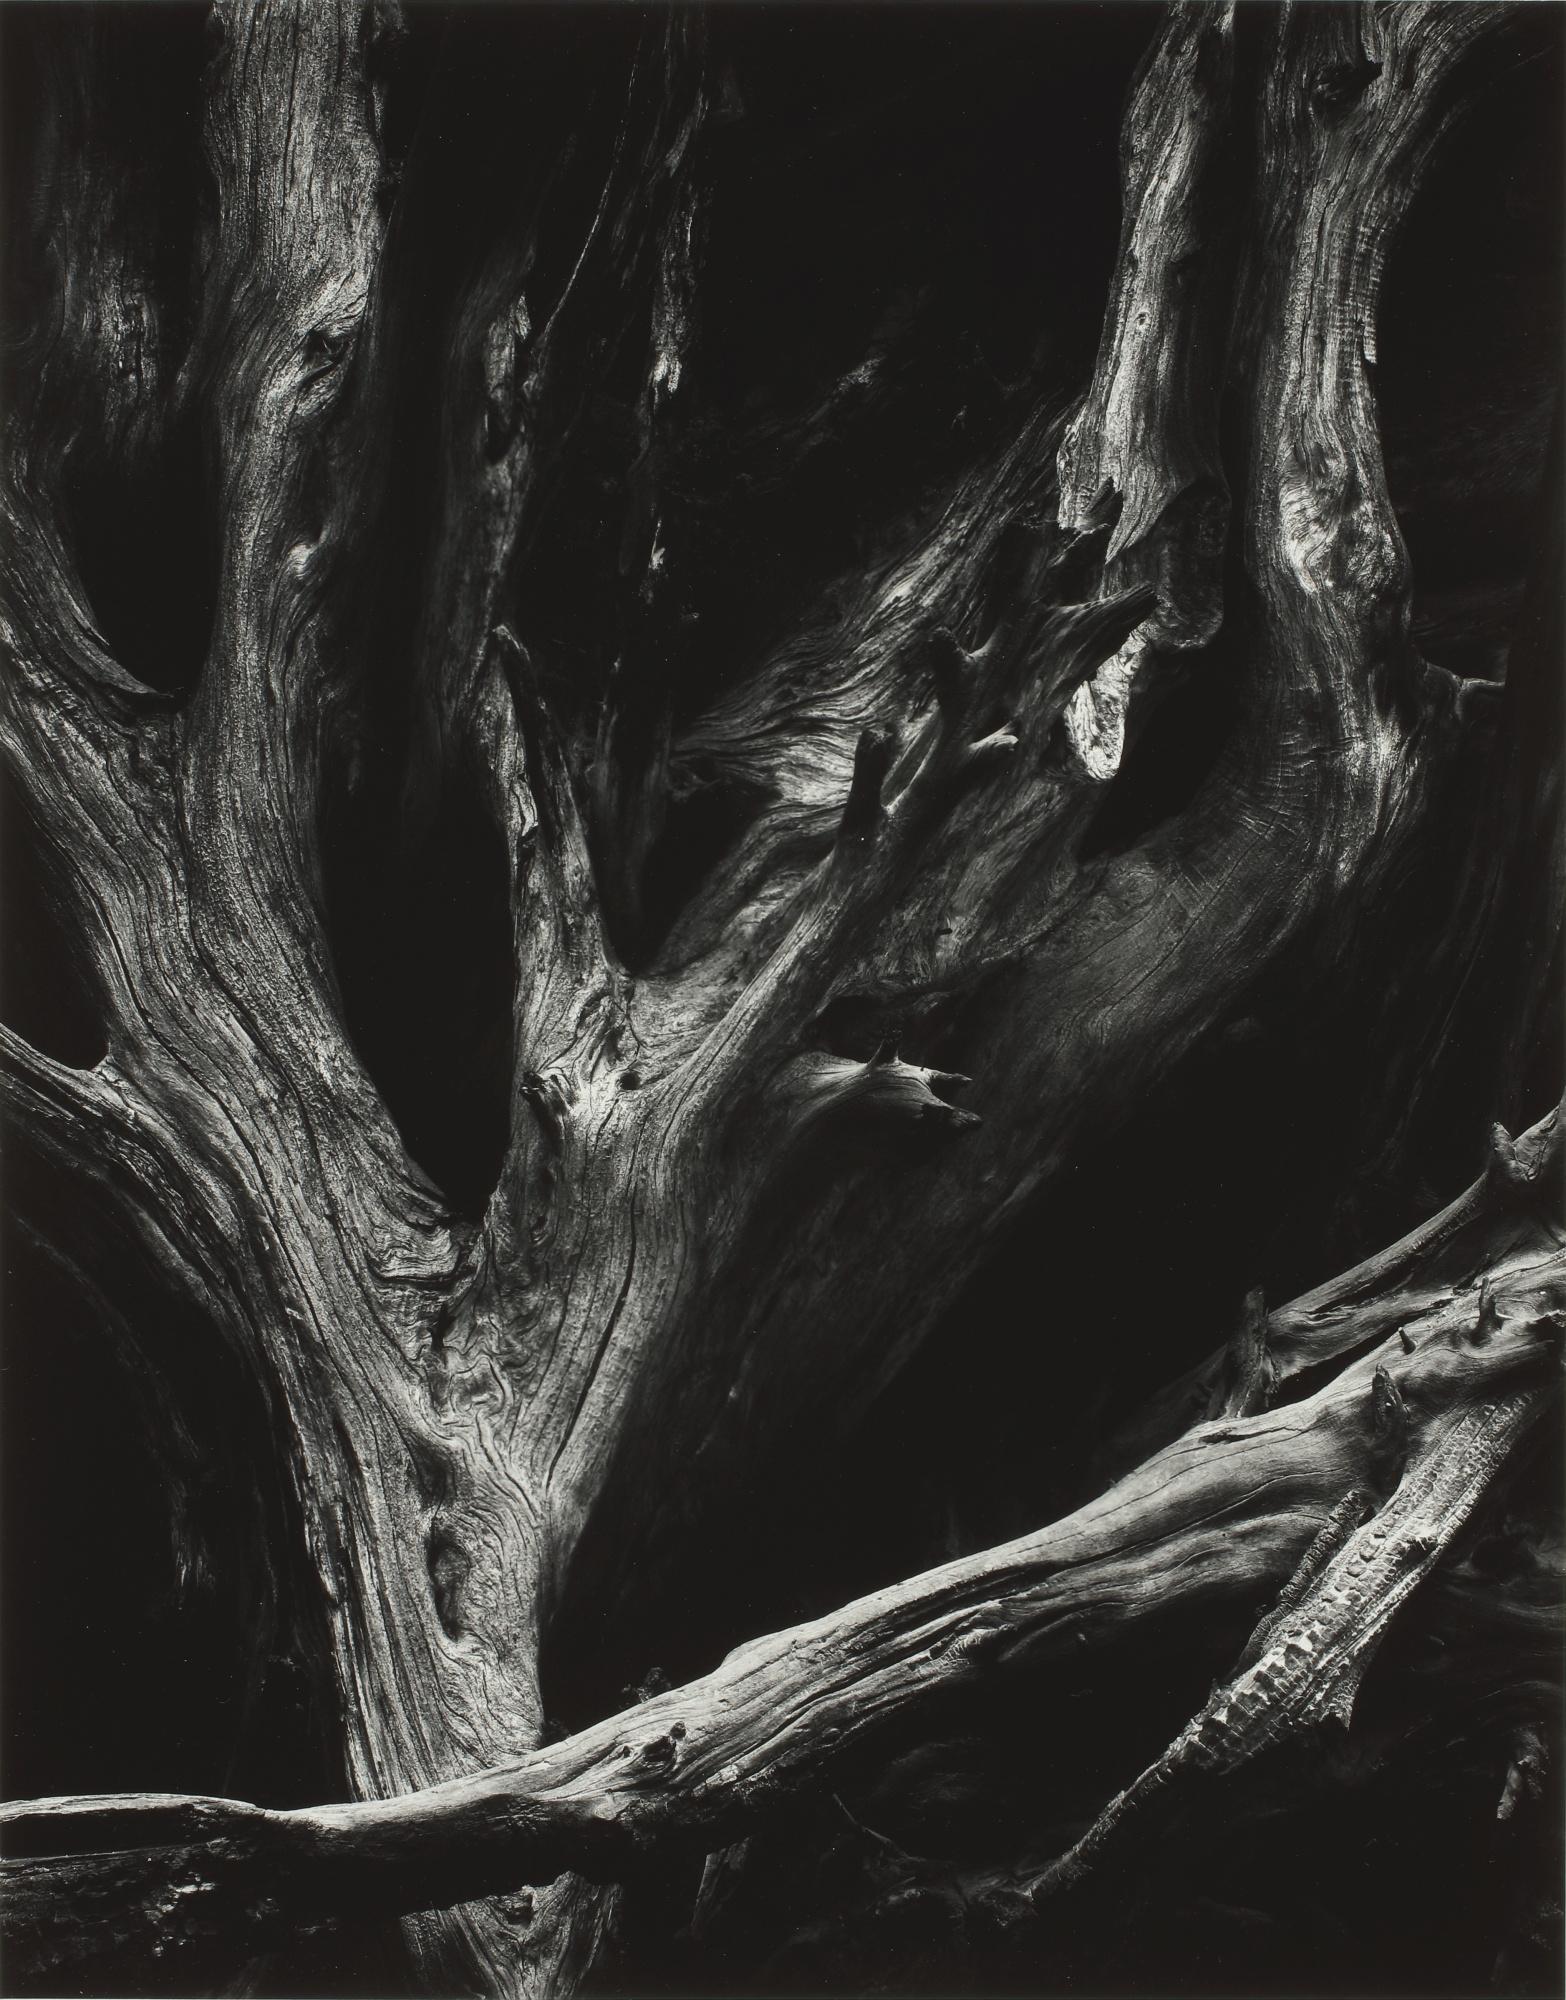 Ansel Adams-Sequoia Roots, Mariposa Grove, Yosemite National Park, California-1950